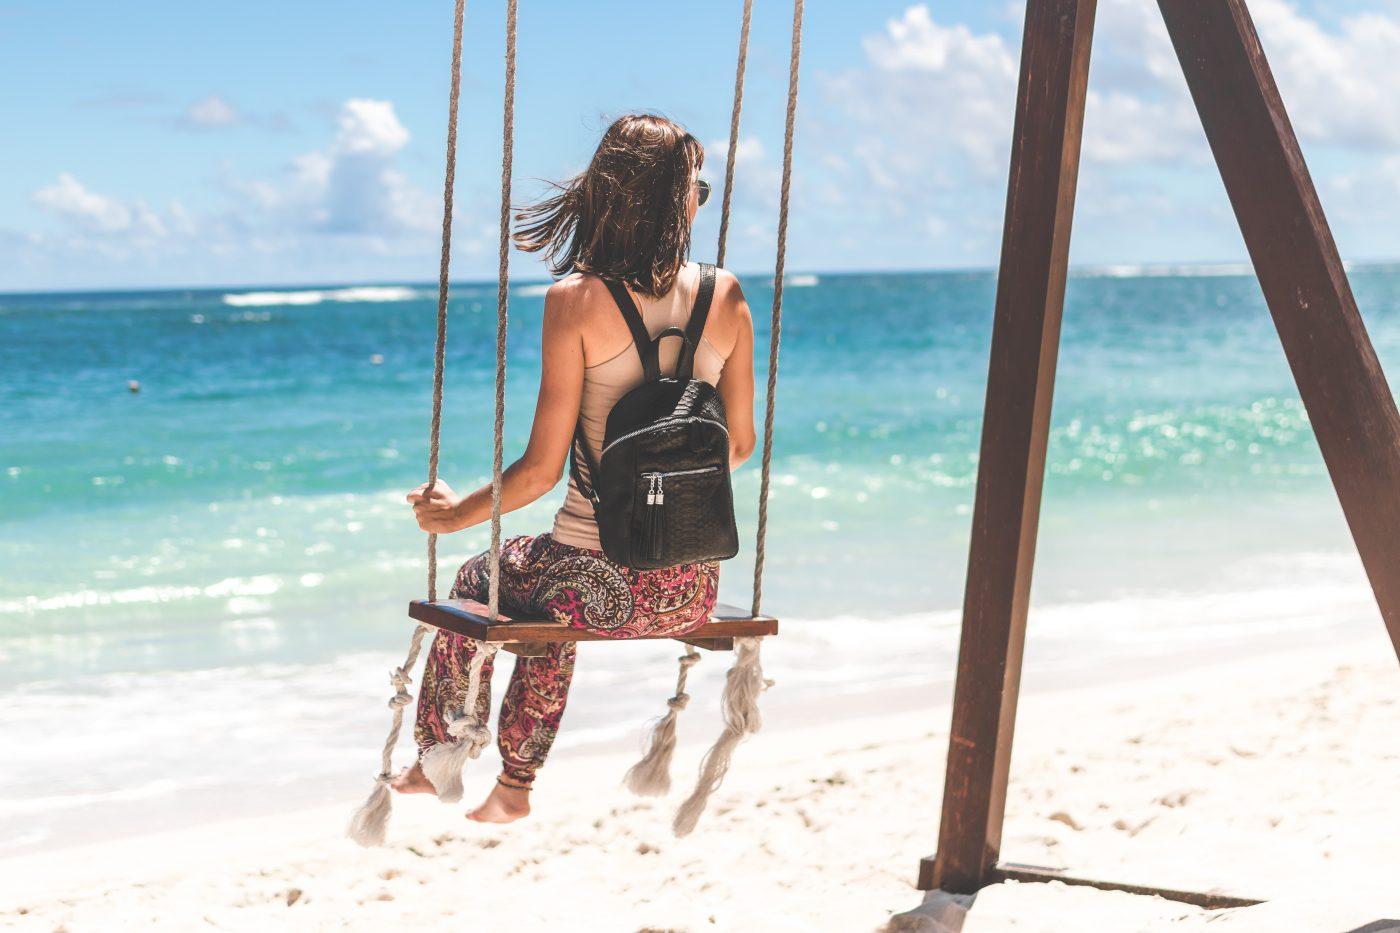 Minimalism: swinging on the beach